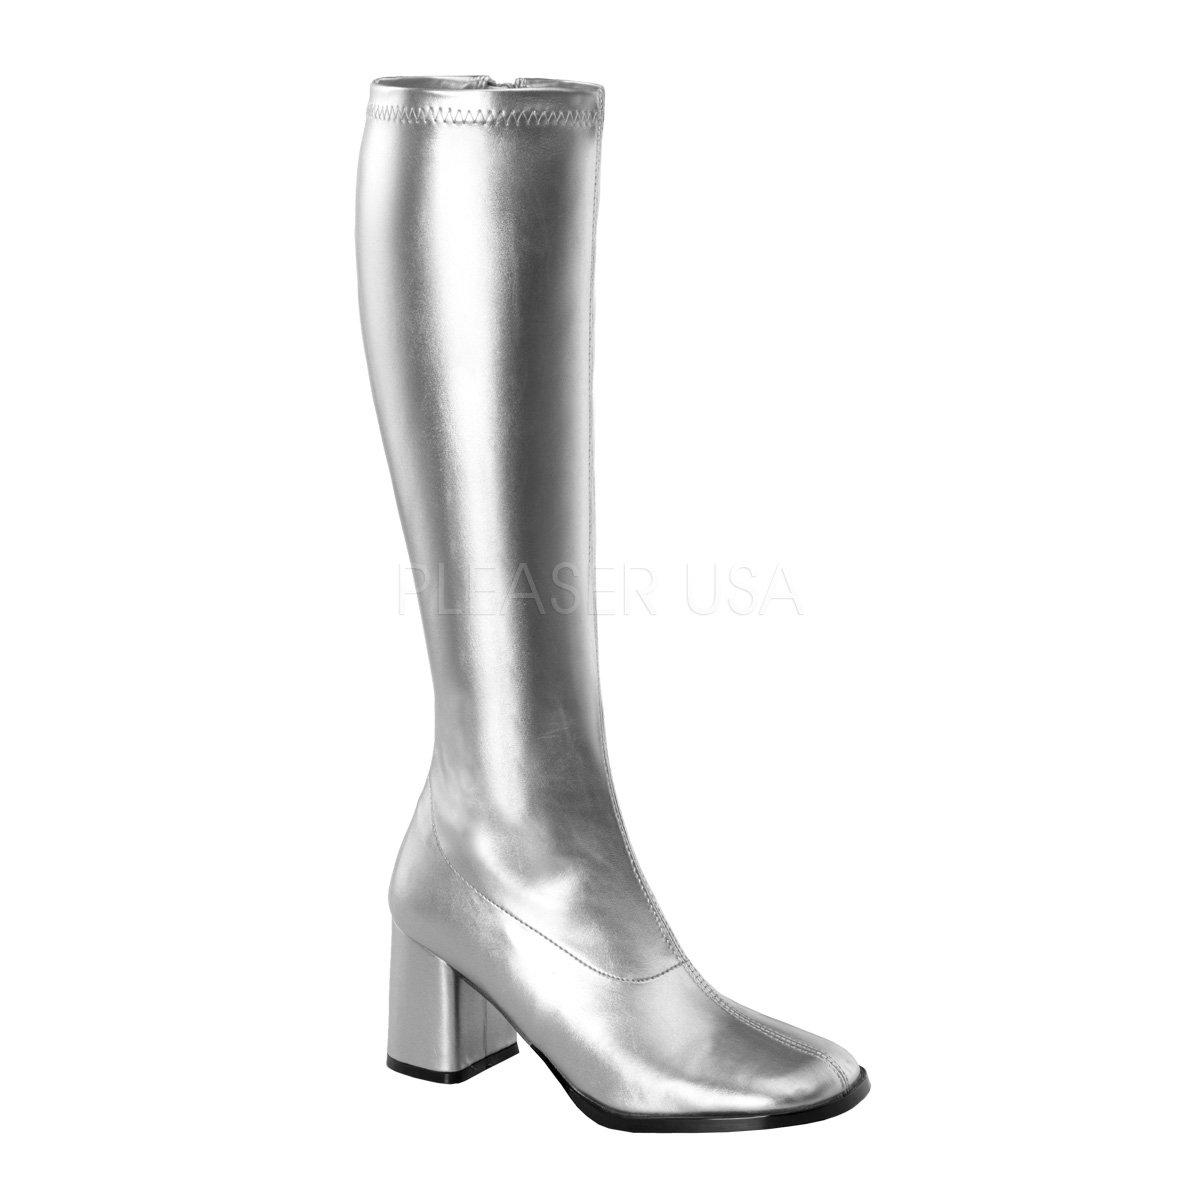 Pleaser Stiefel GOGO-300 - matt Silber Gr. 43